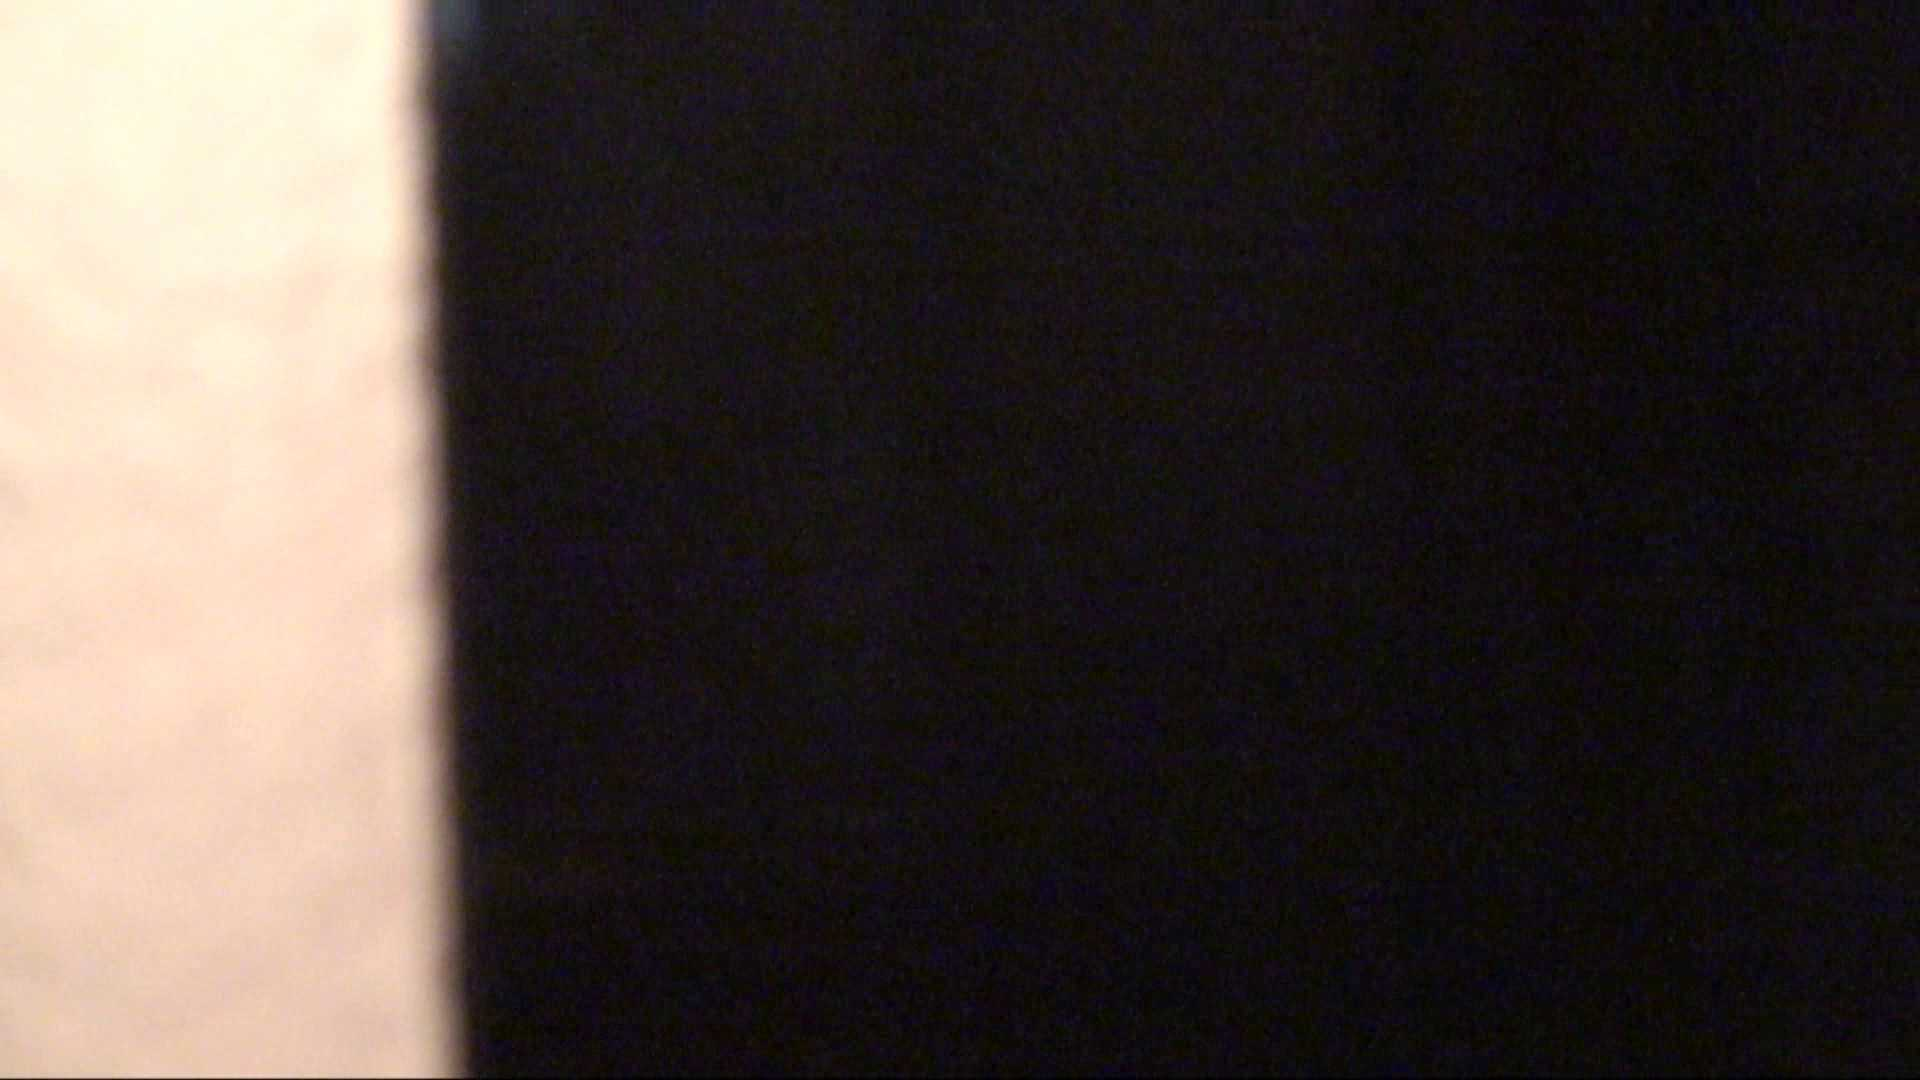 vol.01必見!白肌嬢の乳首が丸見え。極上美人のすっぴん顔をハイビジョンで! 美人 エロ無料画像 89pic 26